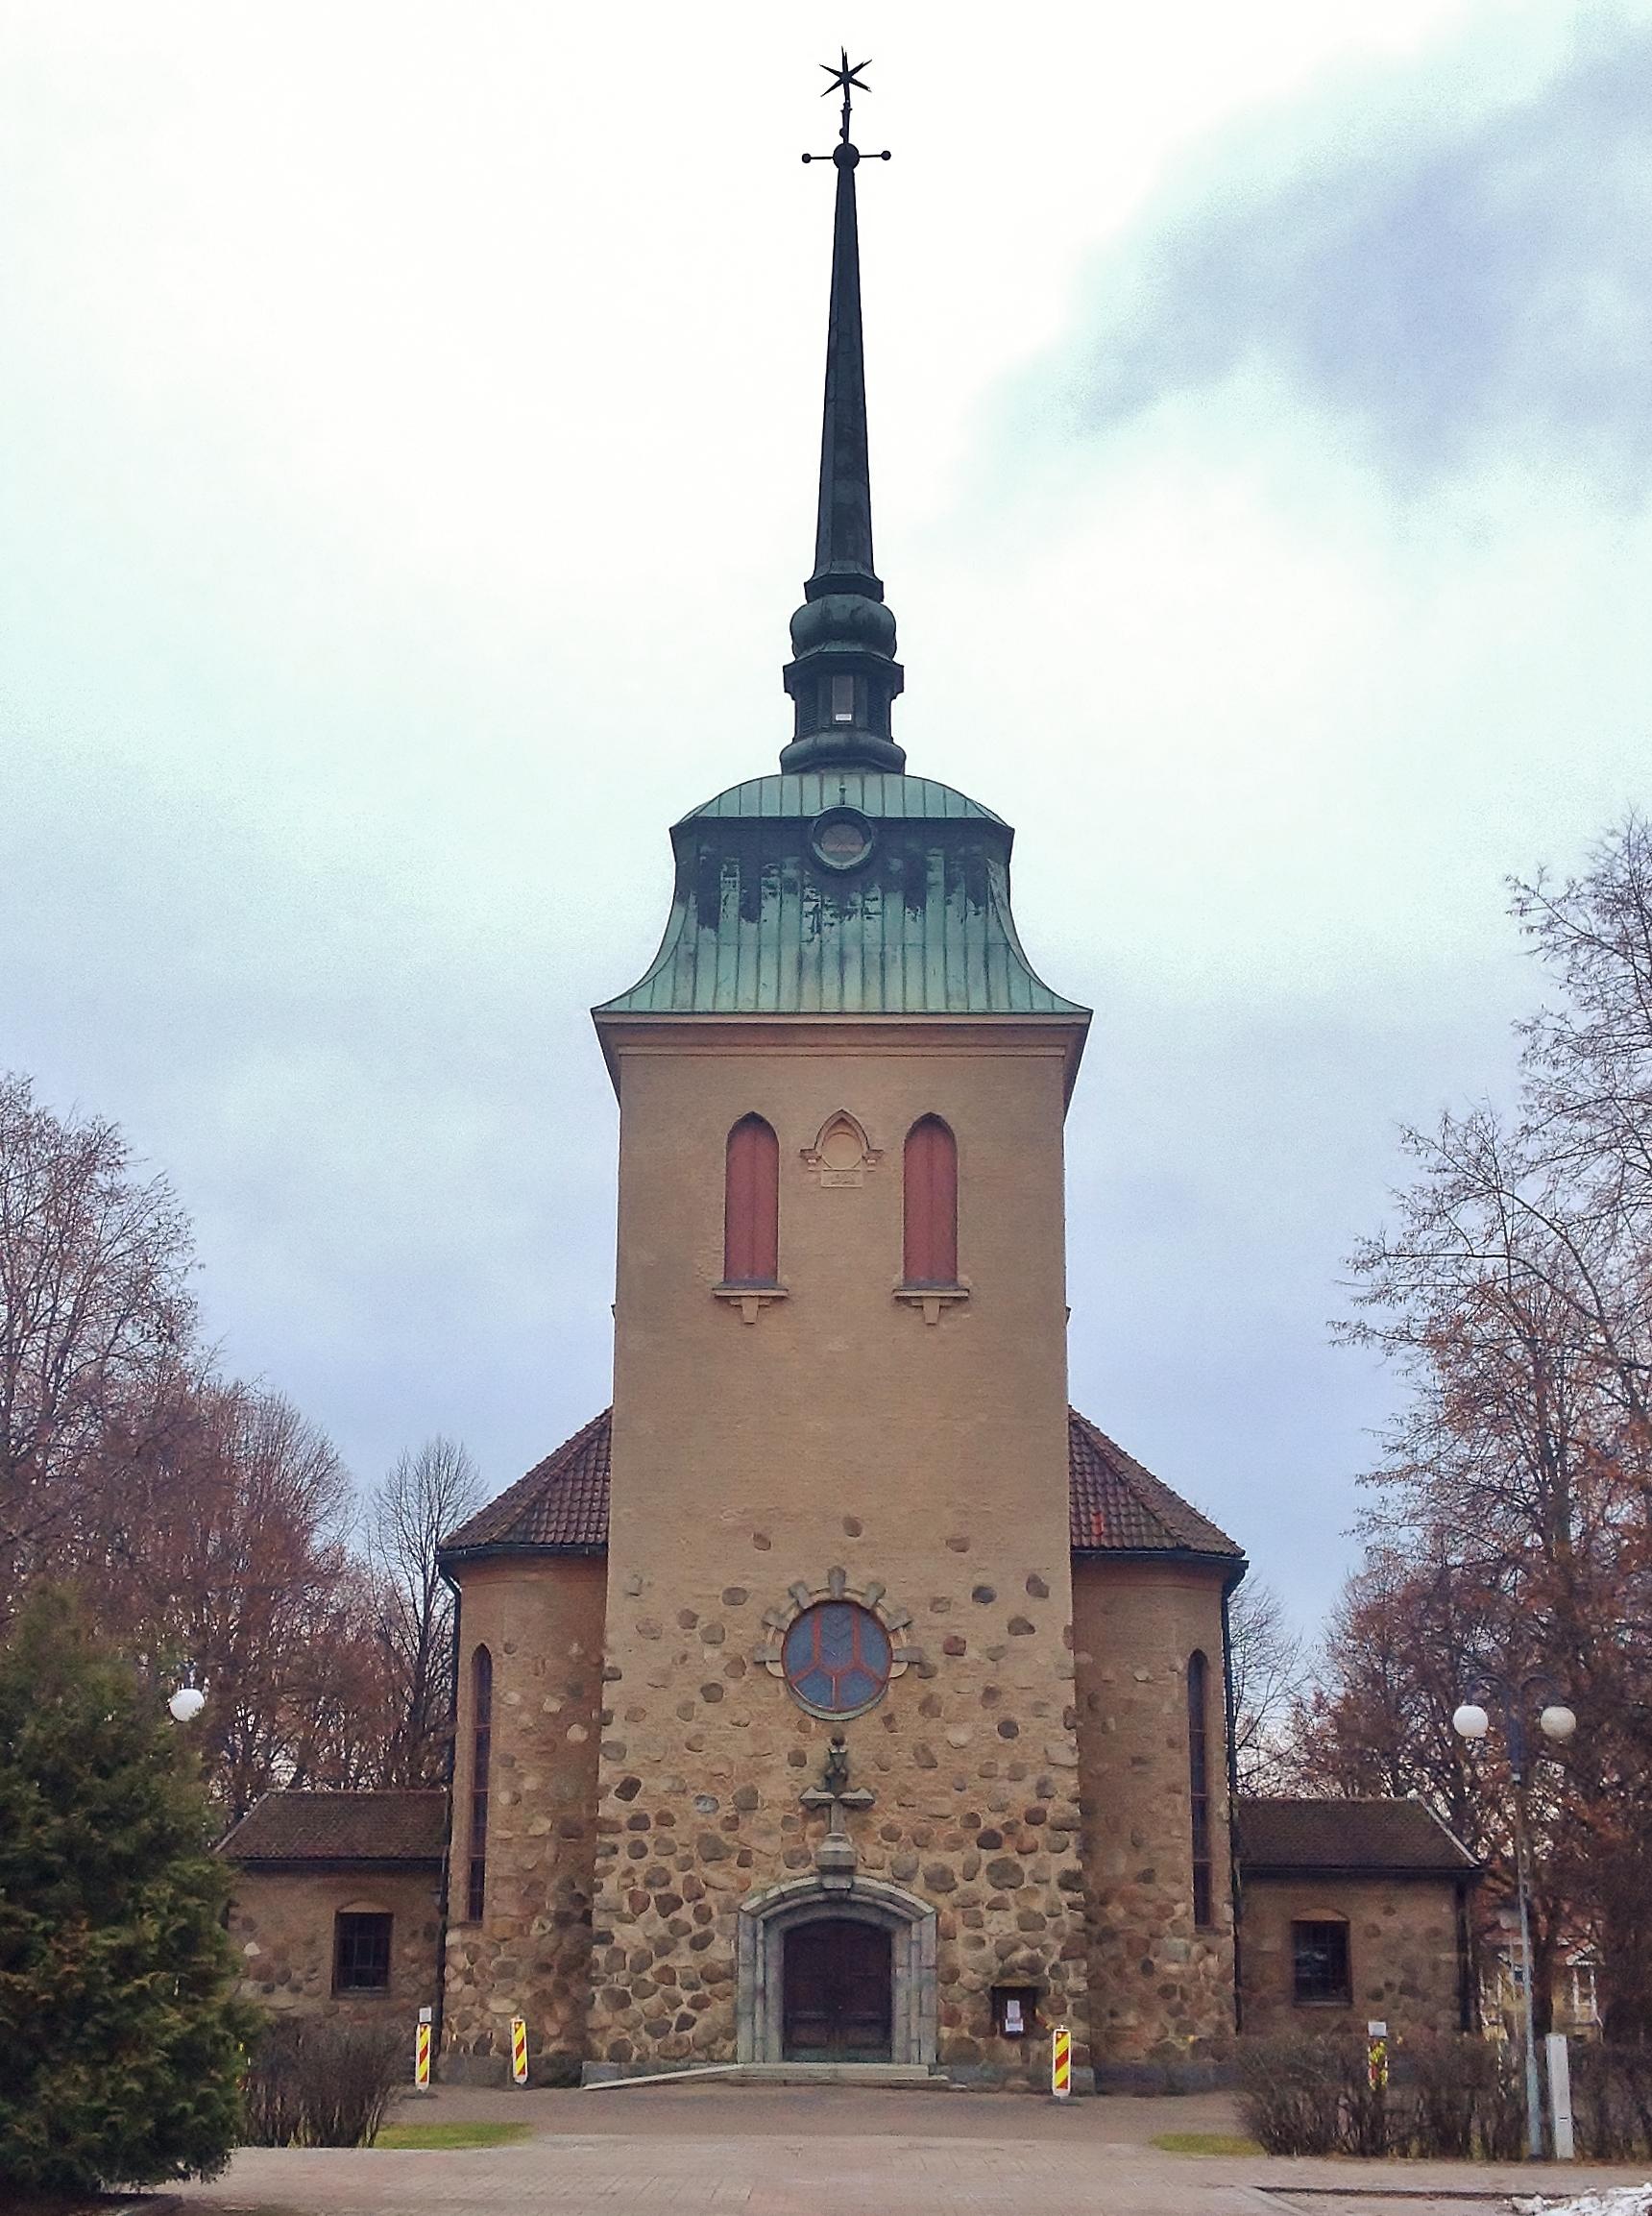 Mänttä Church on 13th December 2015 1.jpg